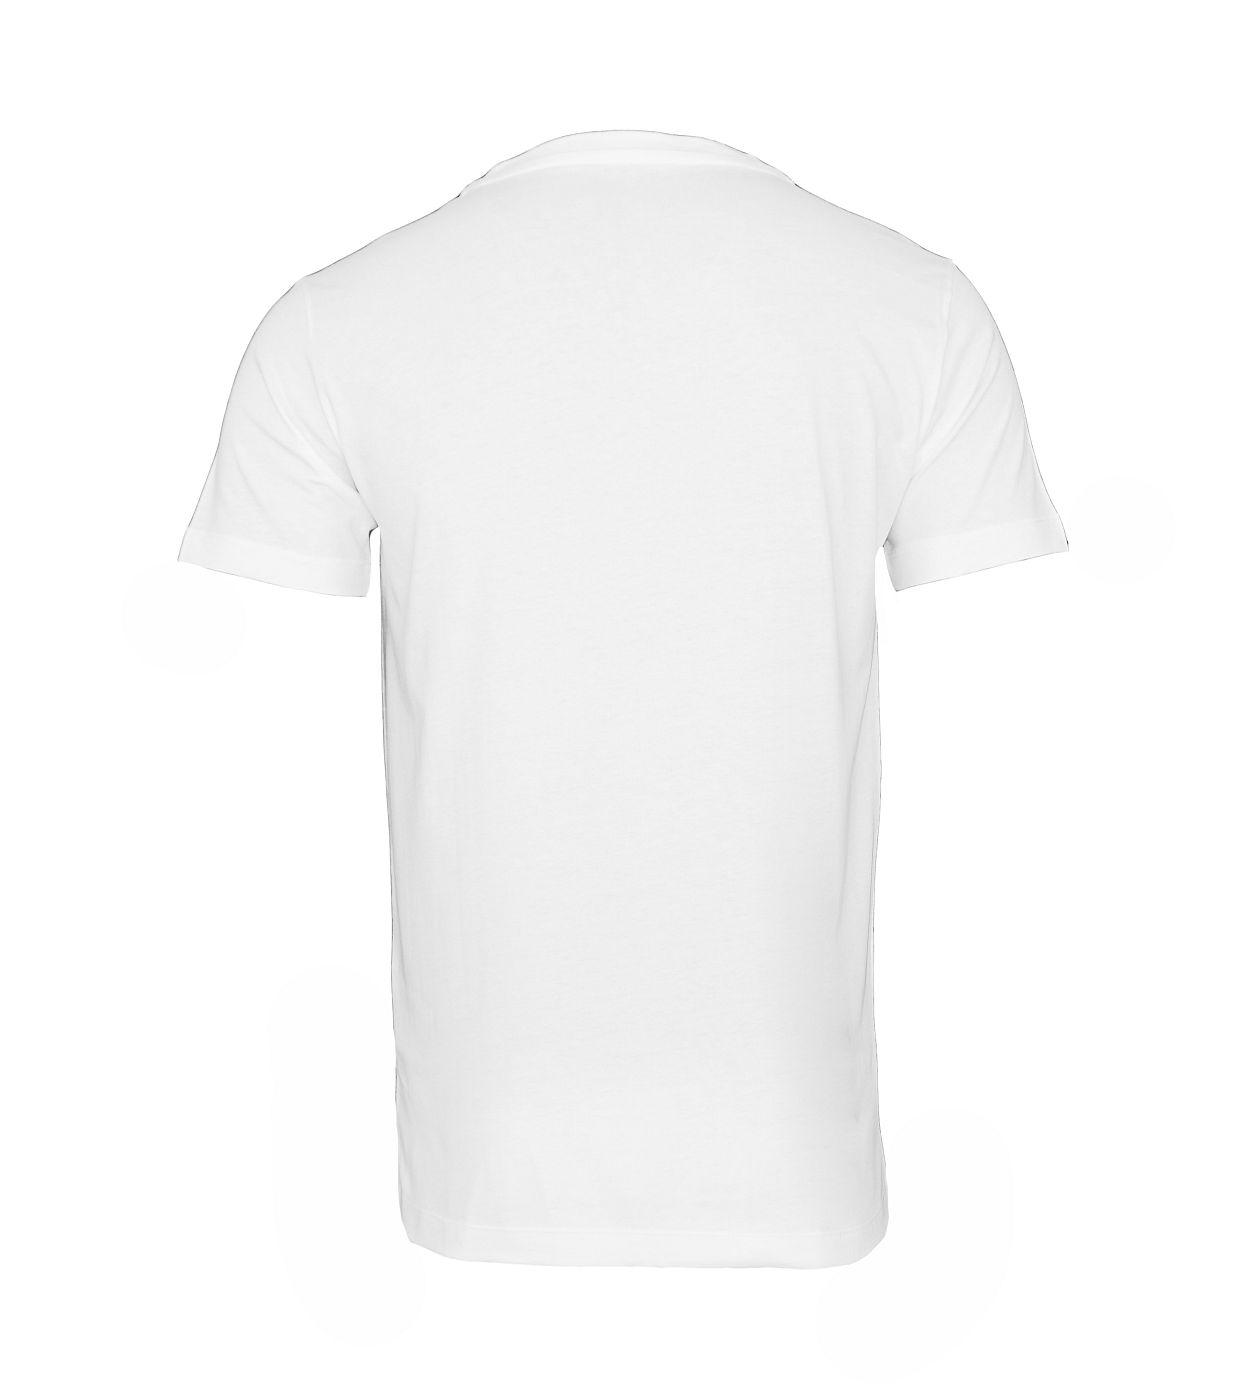 Replay 2er Pack T-Shirts Rundhals M3588 22602 040 black, white S18-RPT1